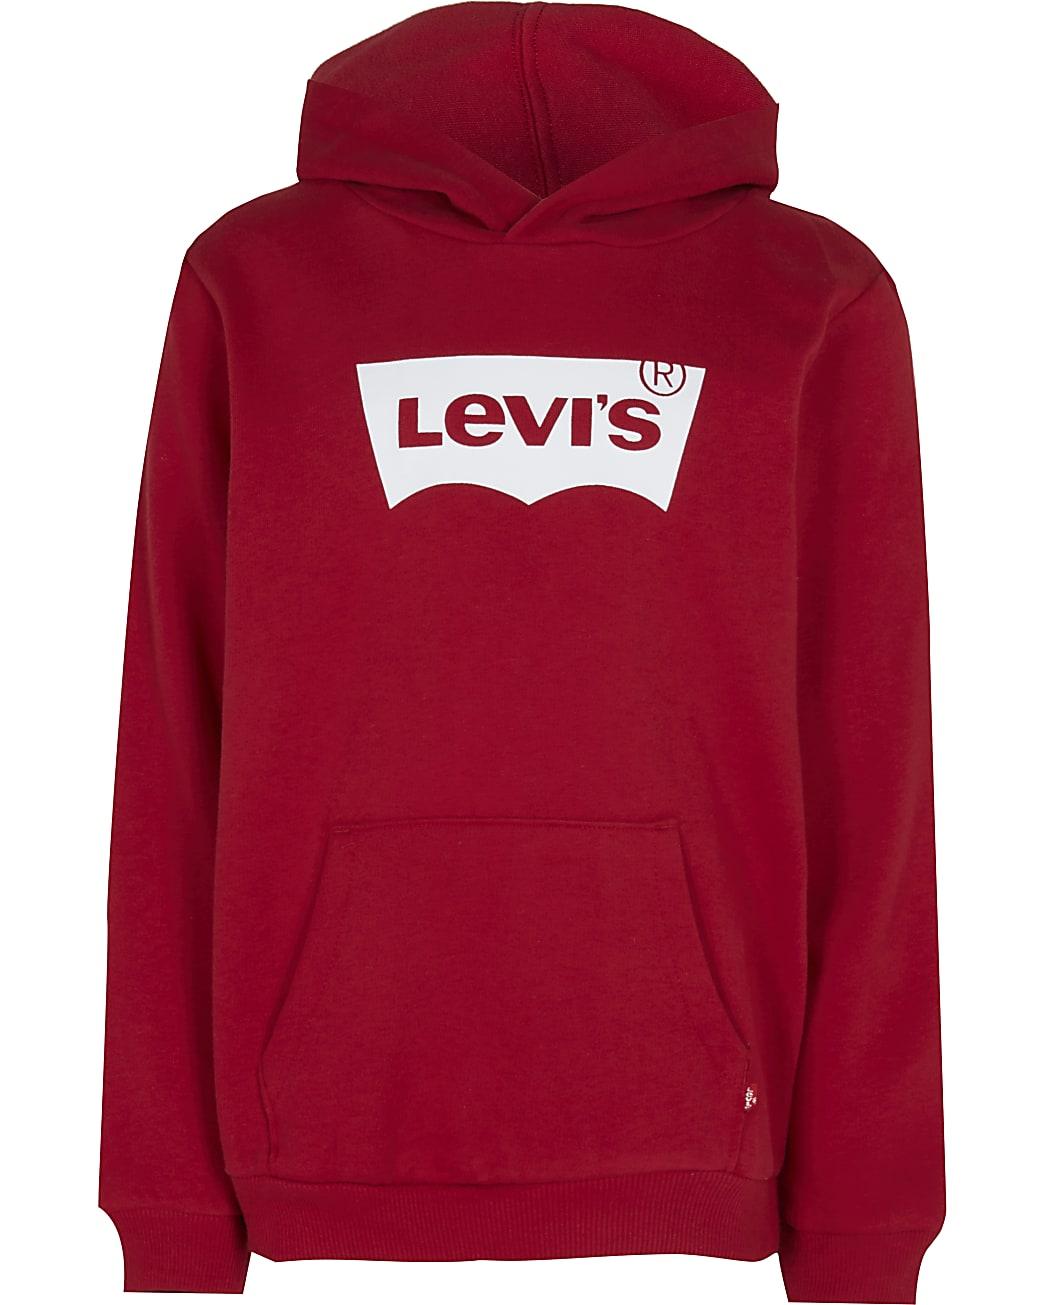 Boys red Levi's hoodie